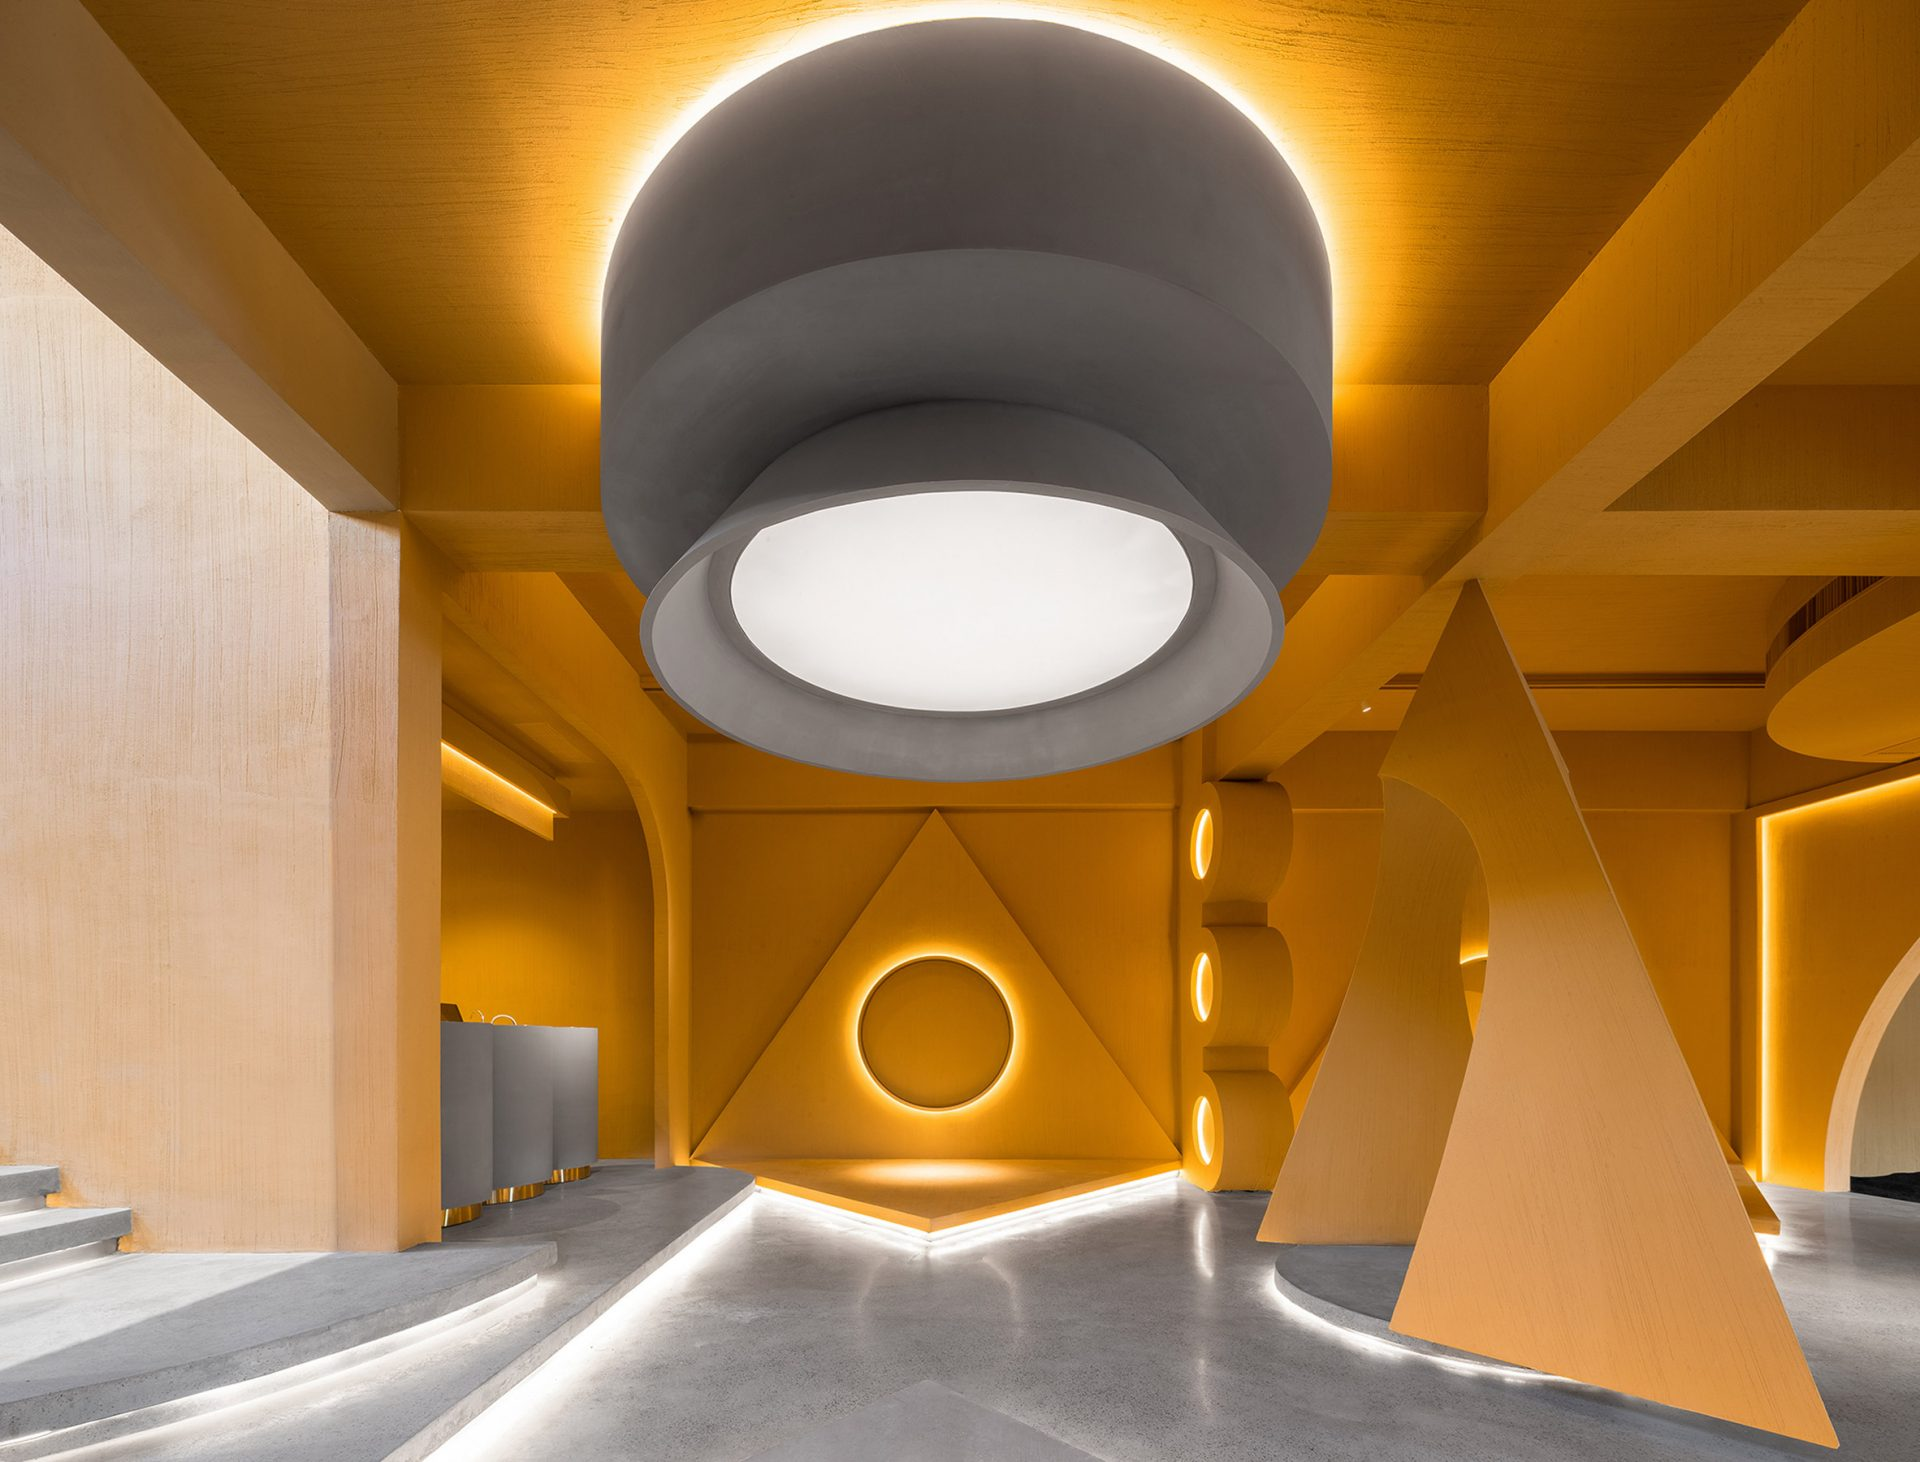 memphis_ya-space_designalive-10